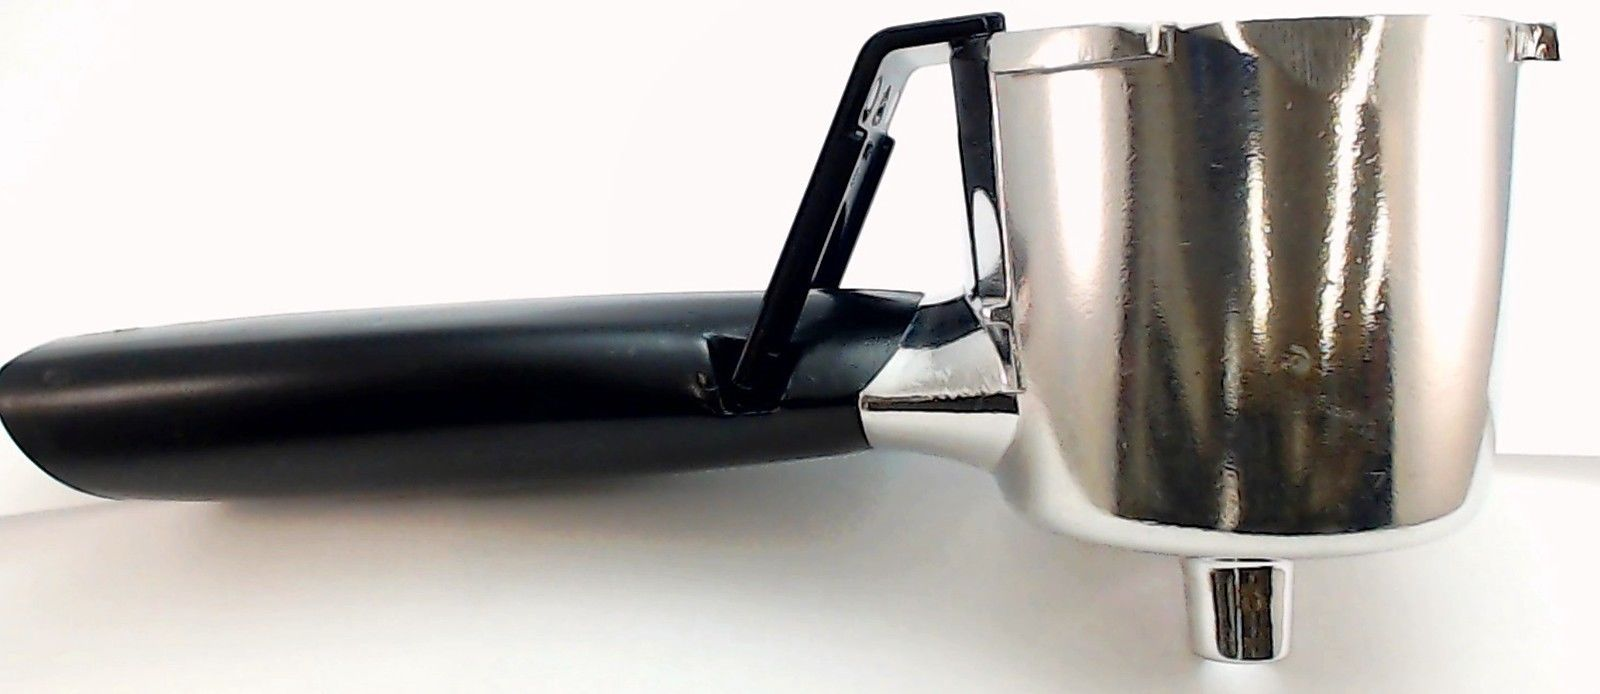 Mr. Coffee Espresso Filter Holder, ECM20, 109018-003 eBay